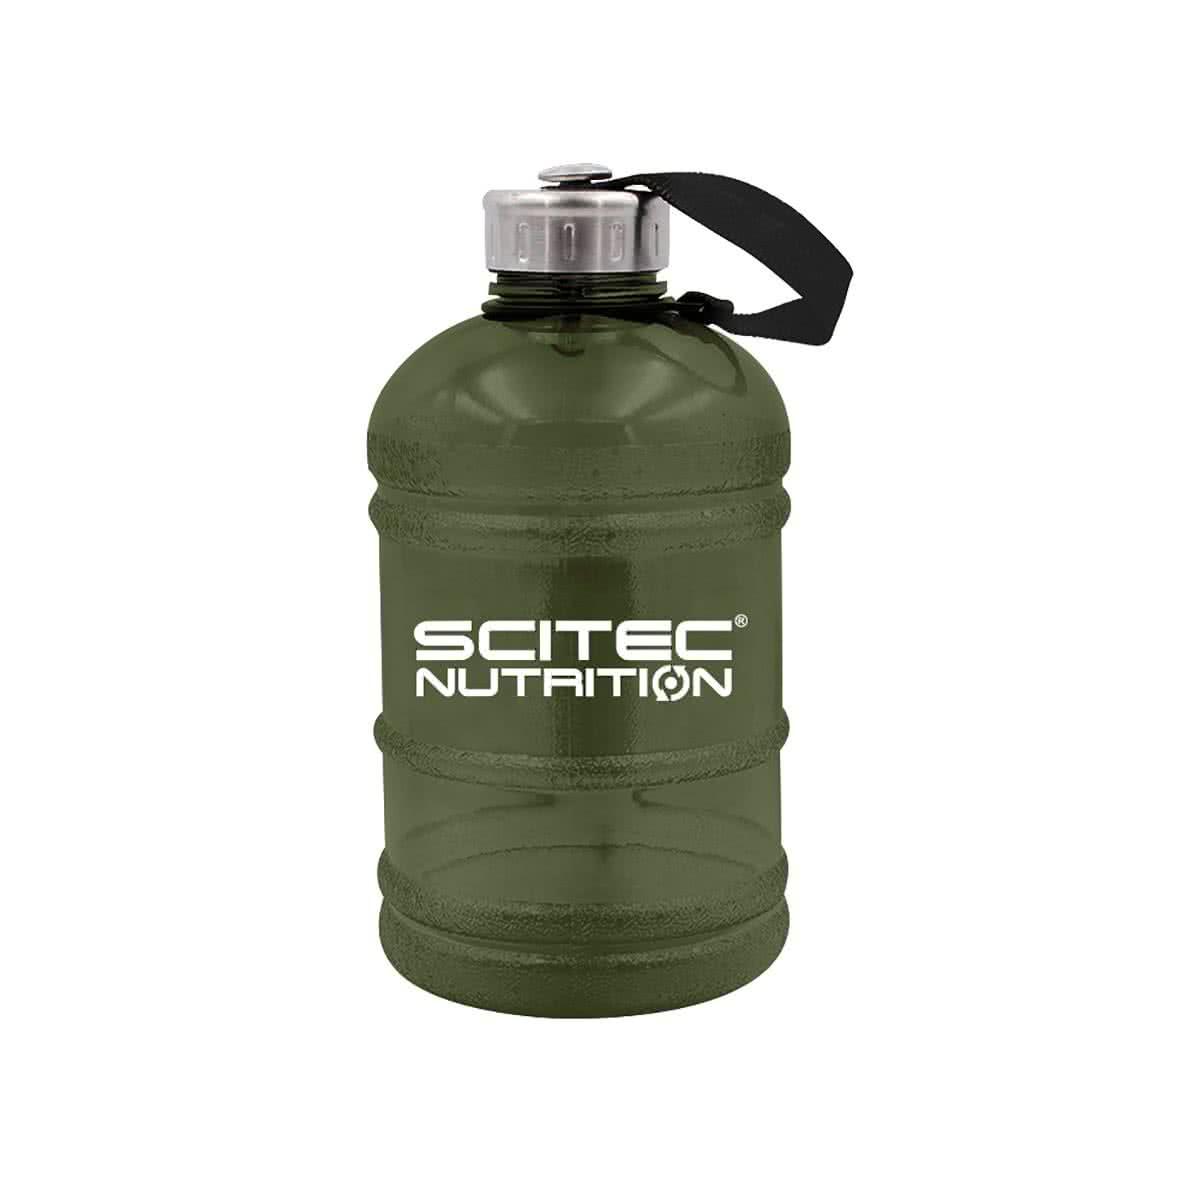 Scitec Nutrition Water Jug 1.89 L